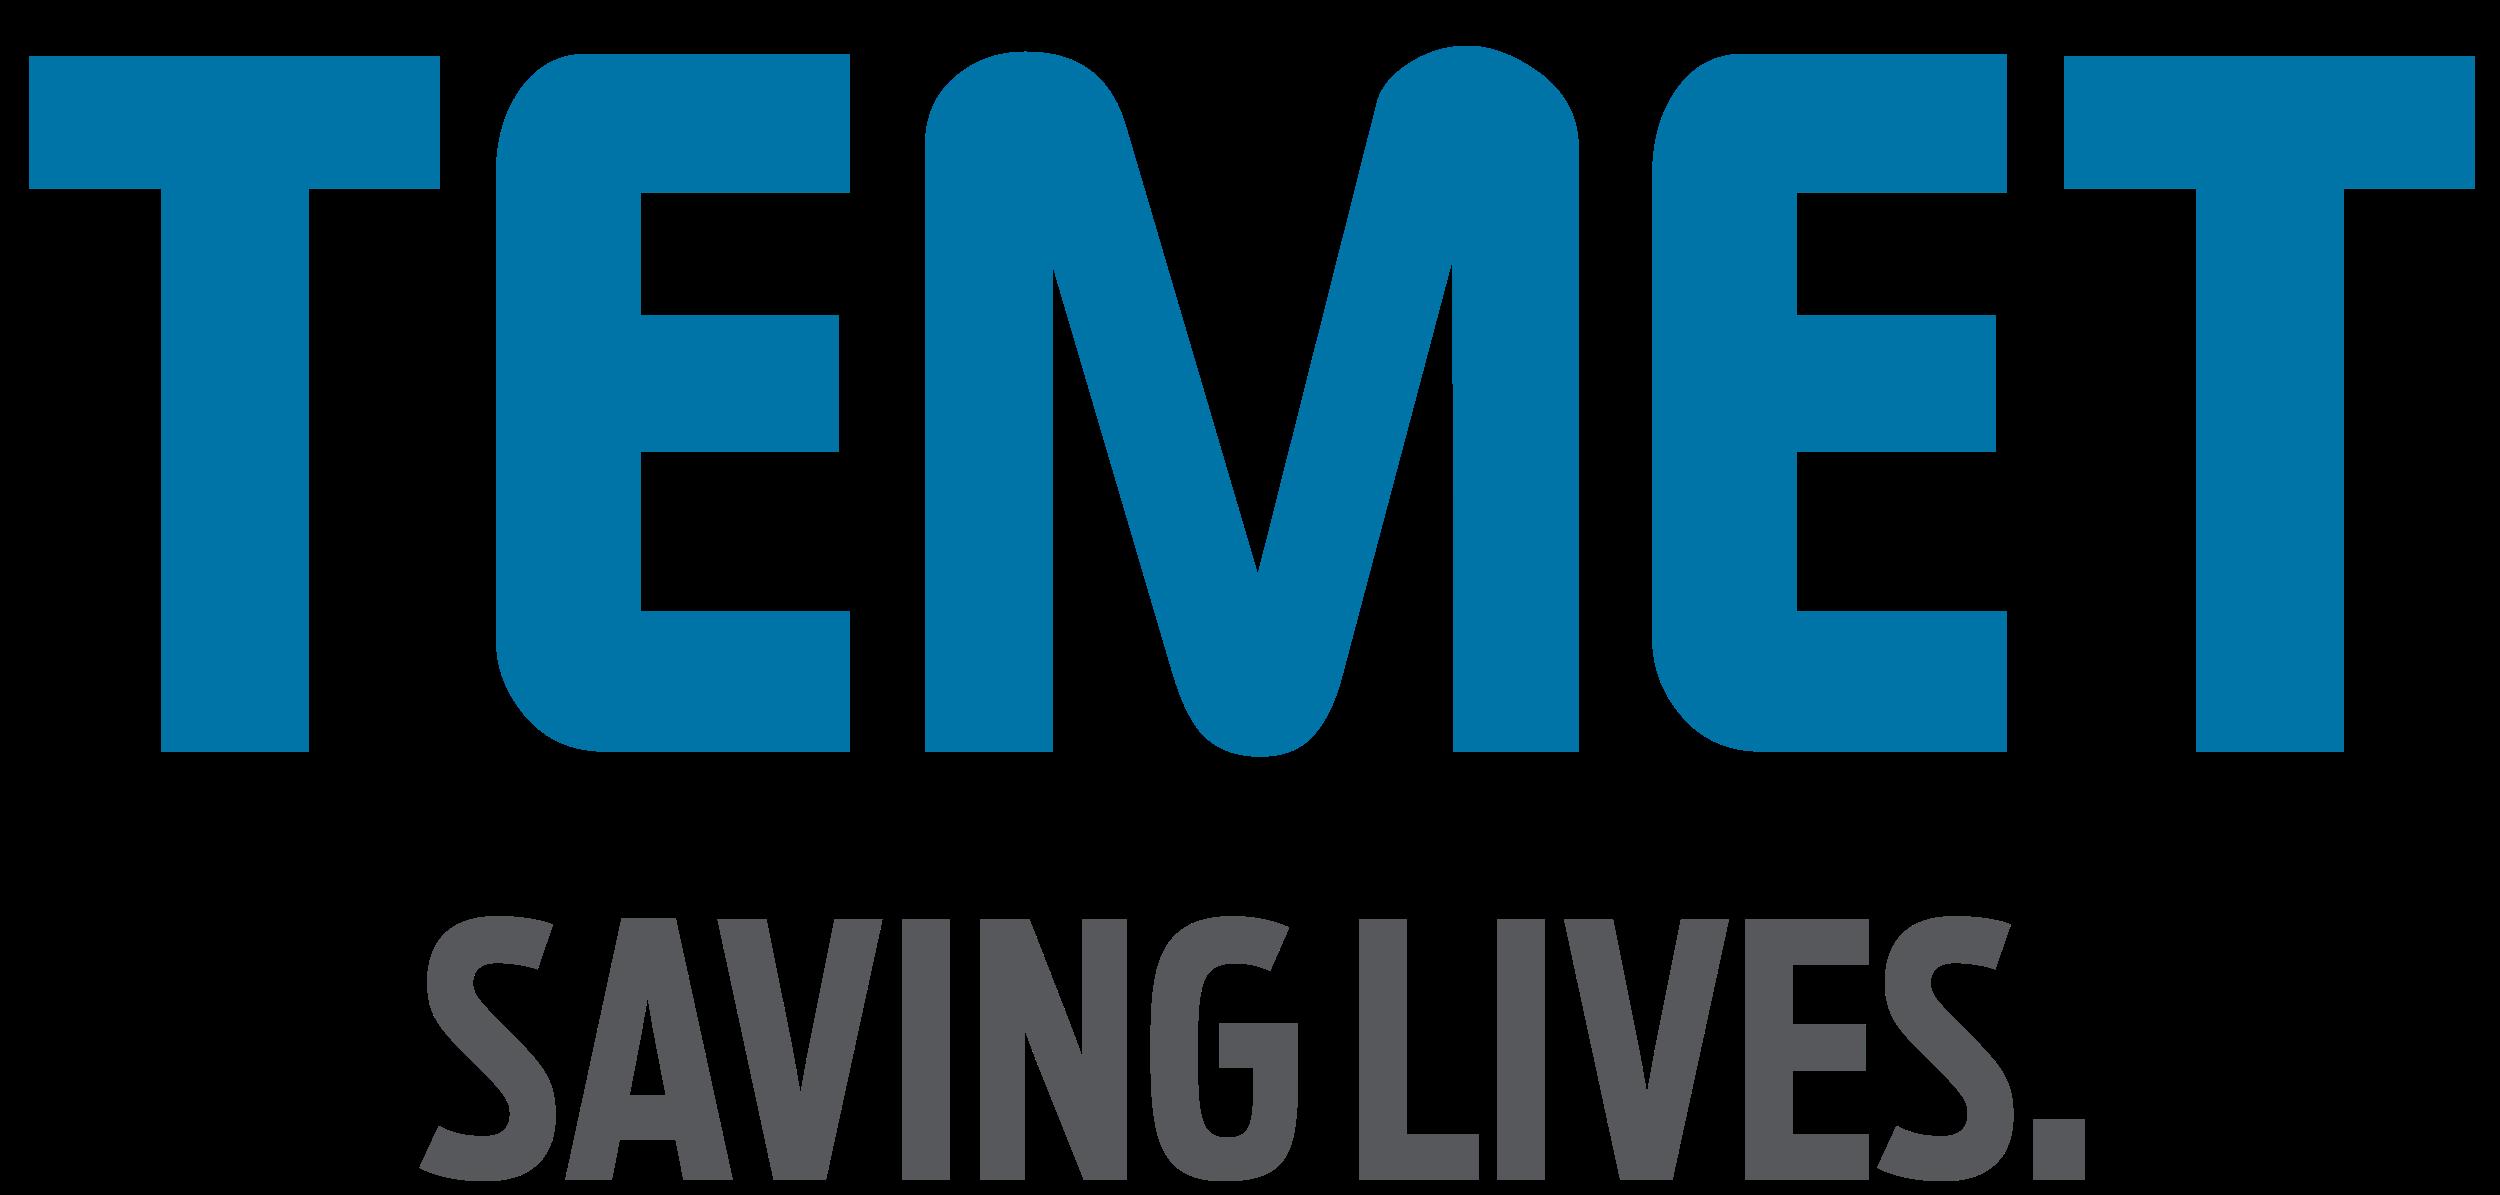 Temet-logo_slogan